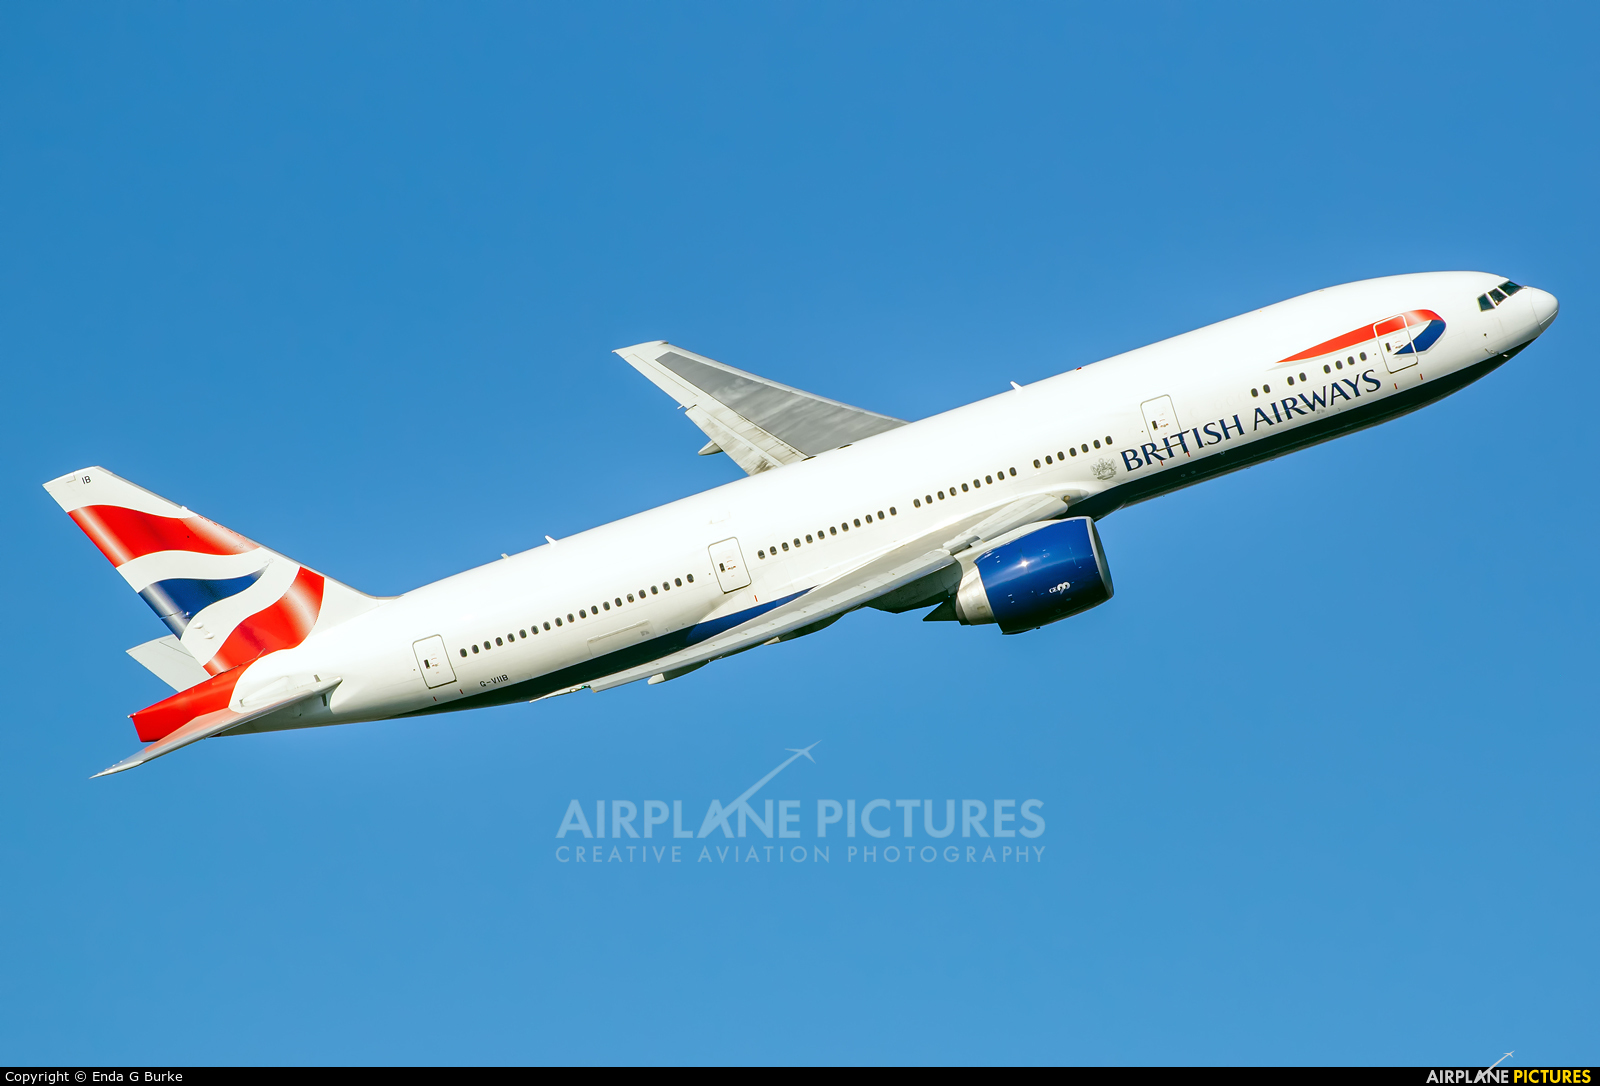 British Airways G-VIIB aircraft at London - Heathrow